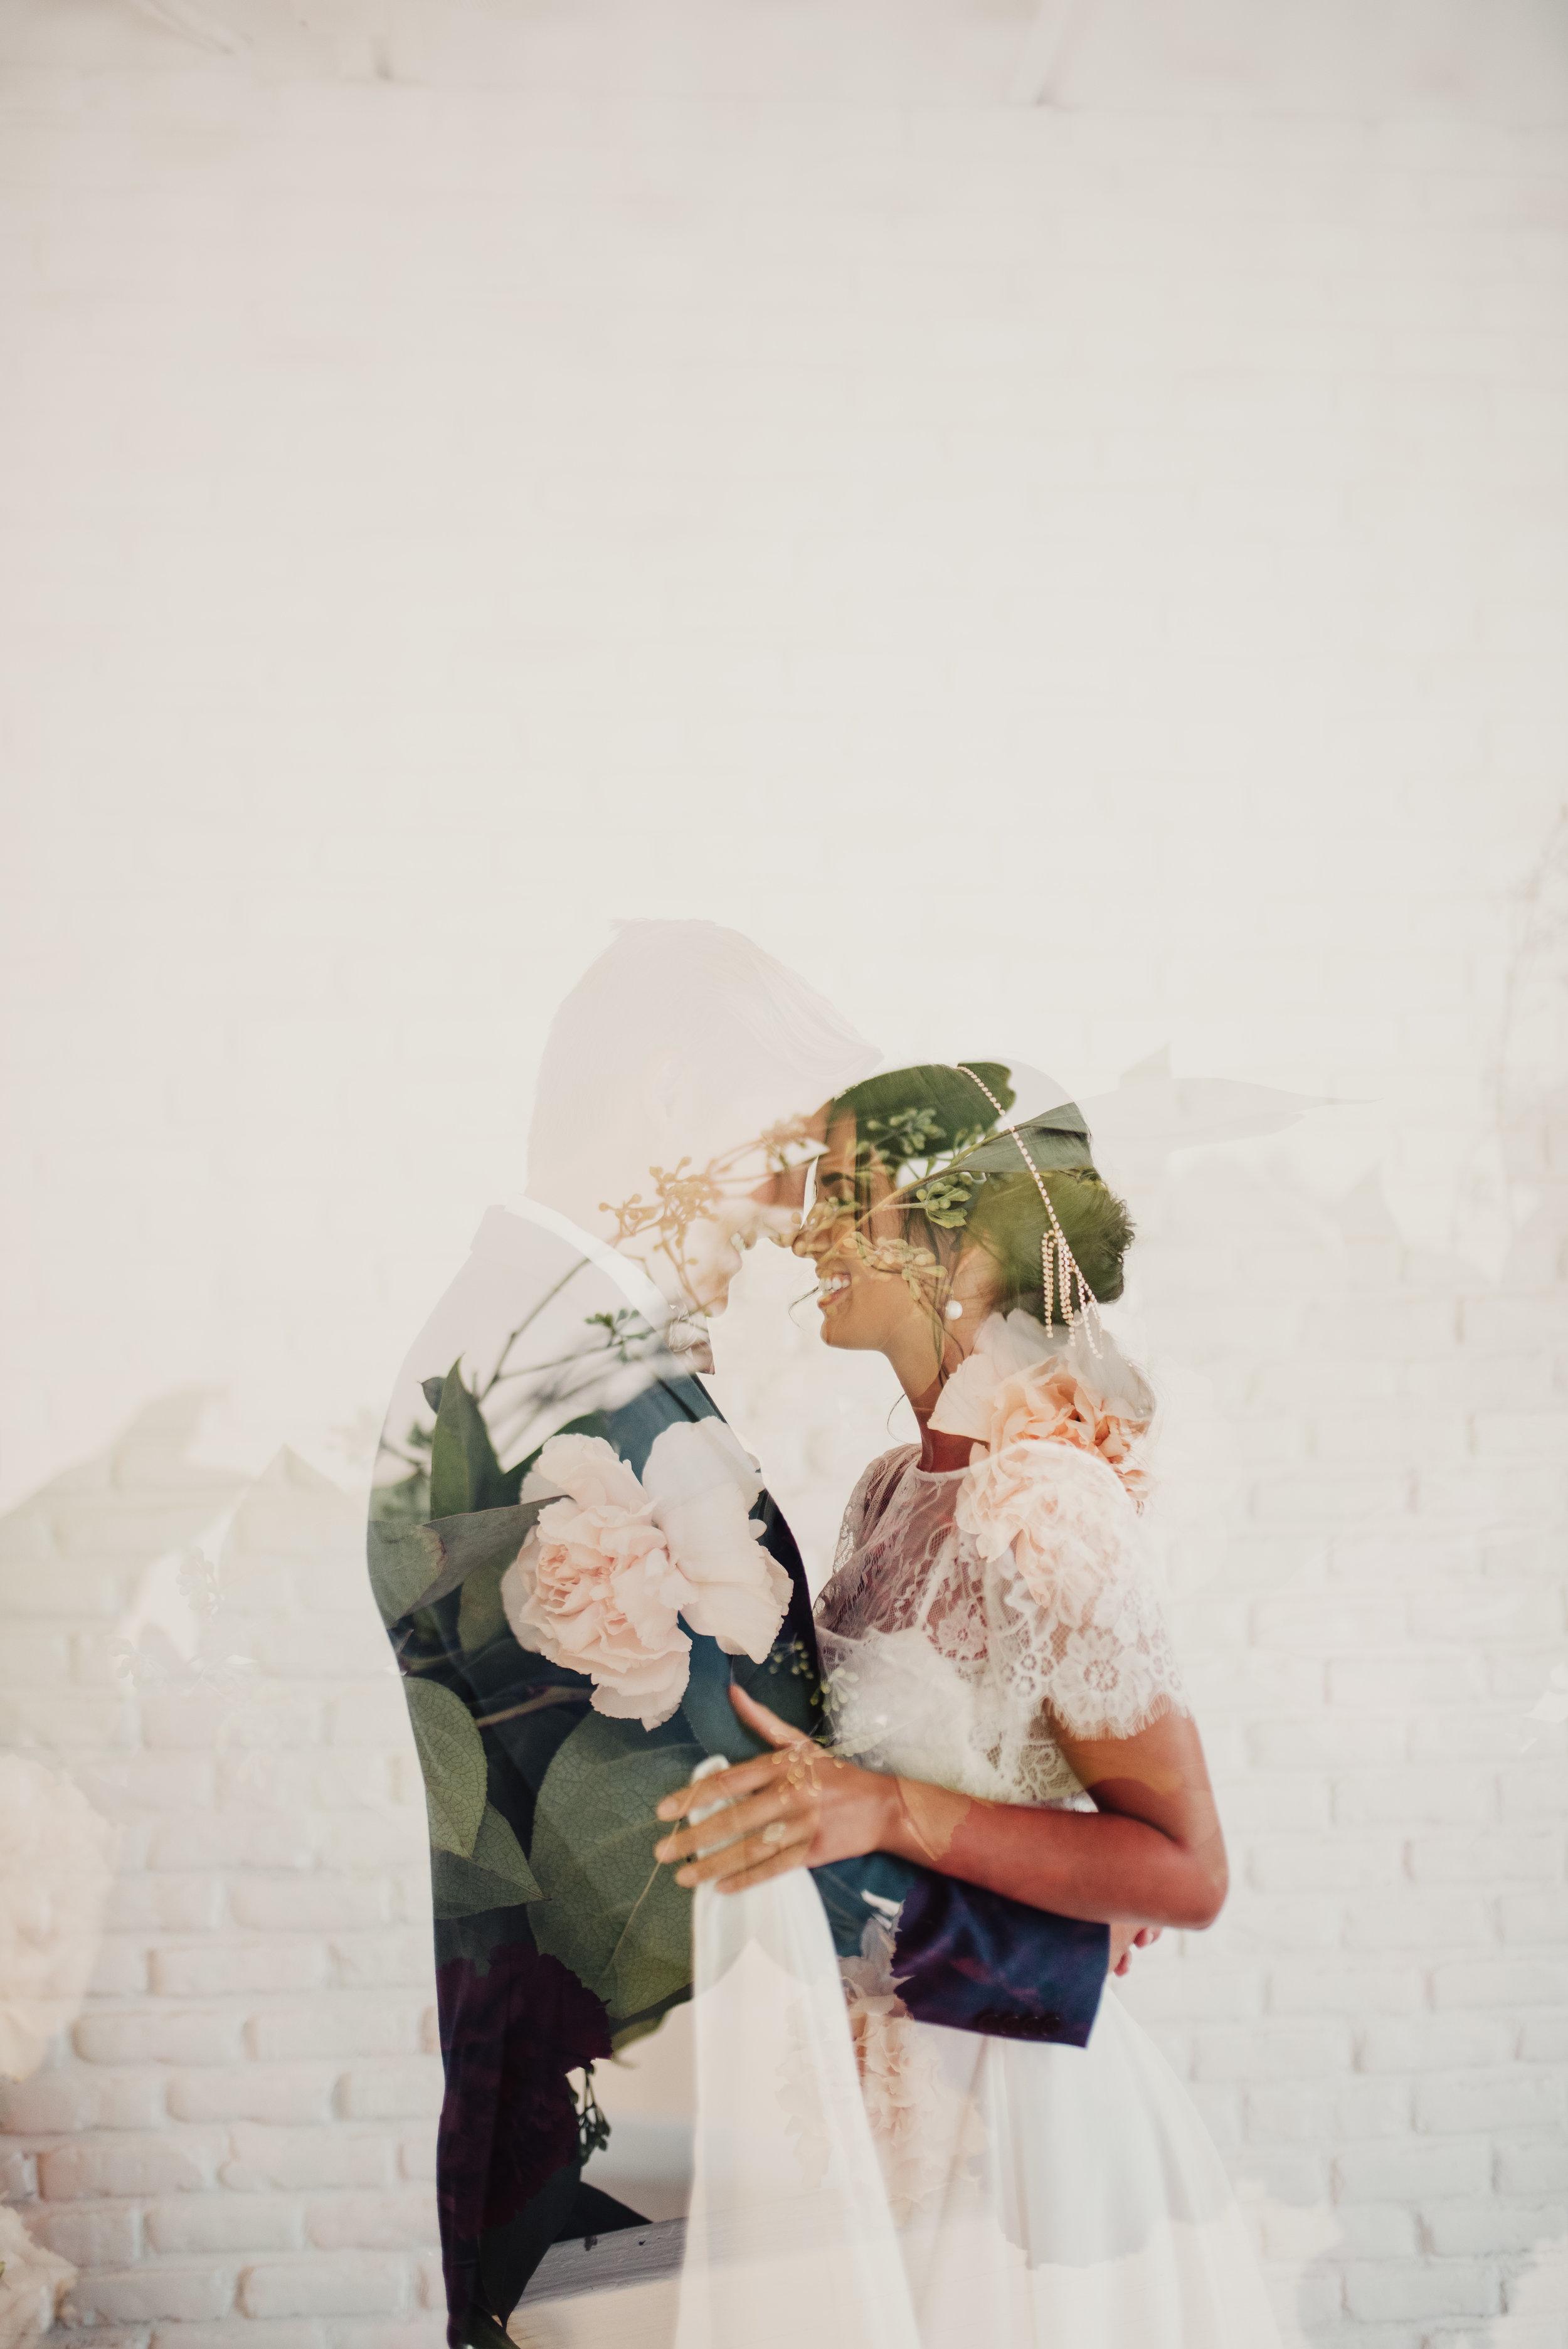 boho-bride-double-exposure-bridals.jpg